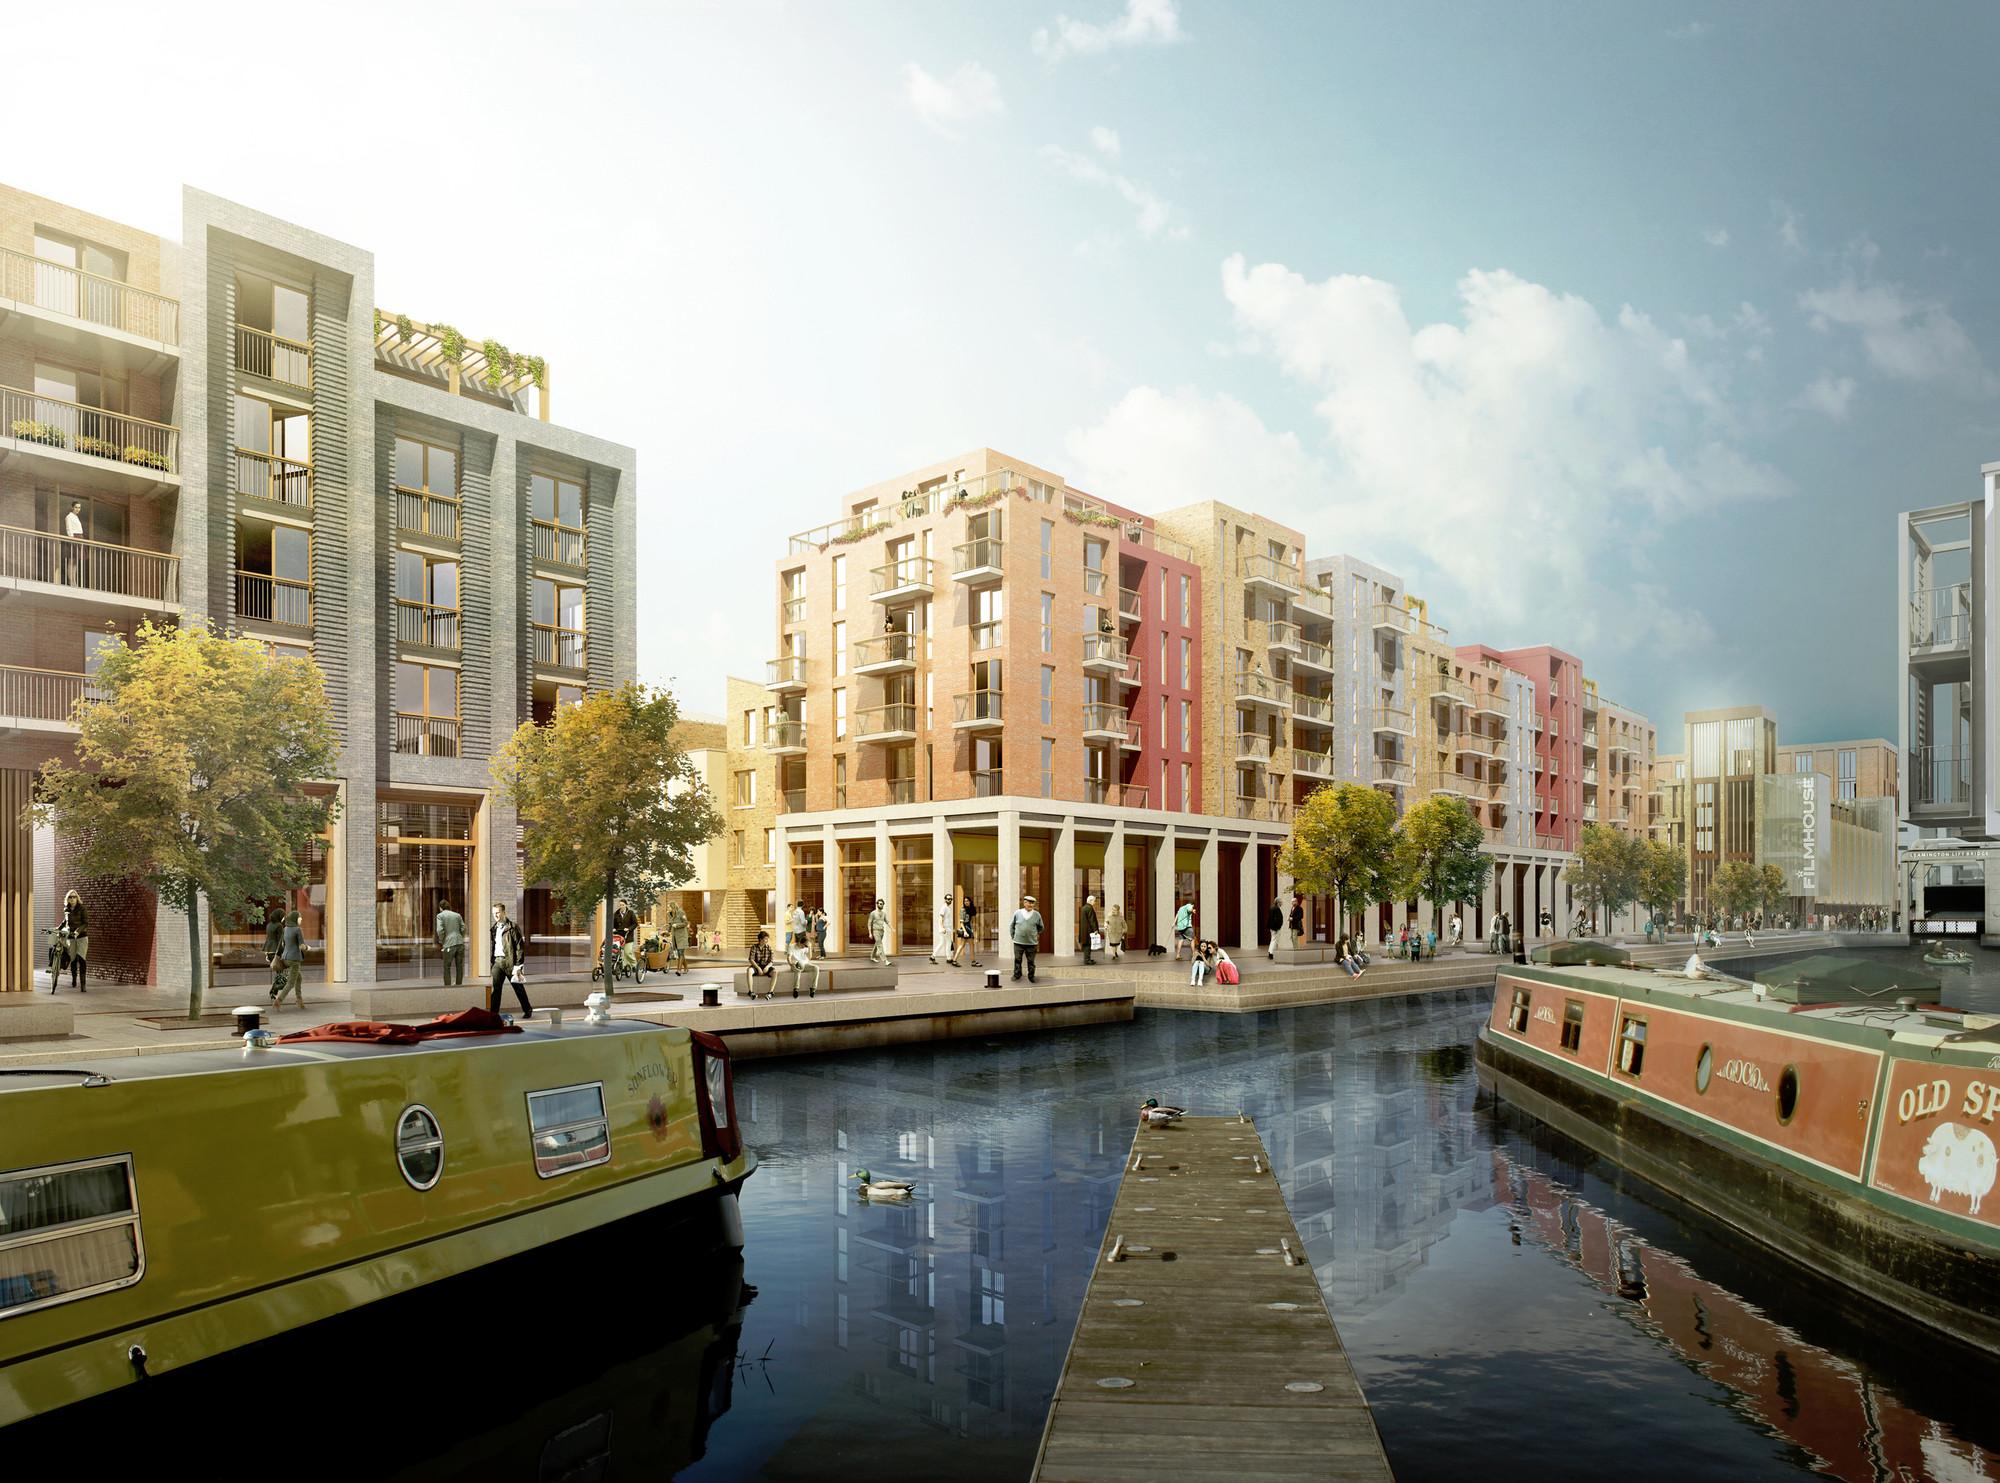 7N Architects Unveils Masterplan for Edinburgh's Fountainbridge Site, Courtesy of 7N Architects